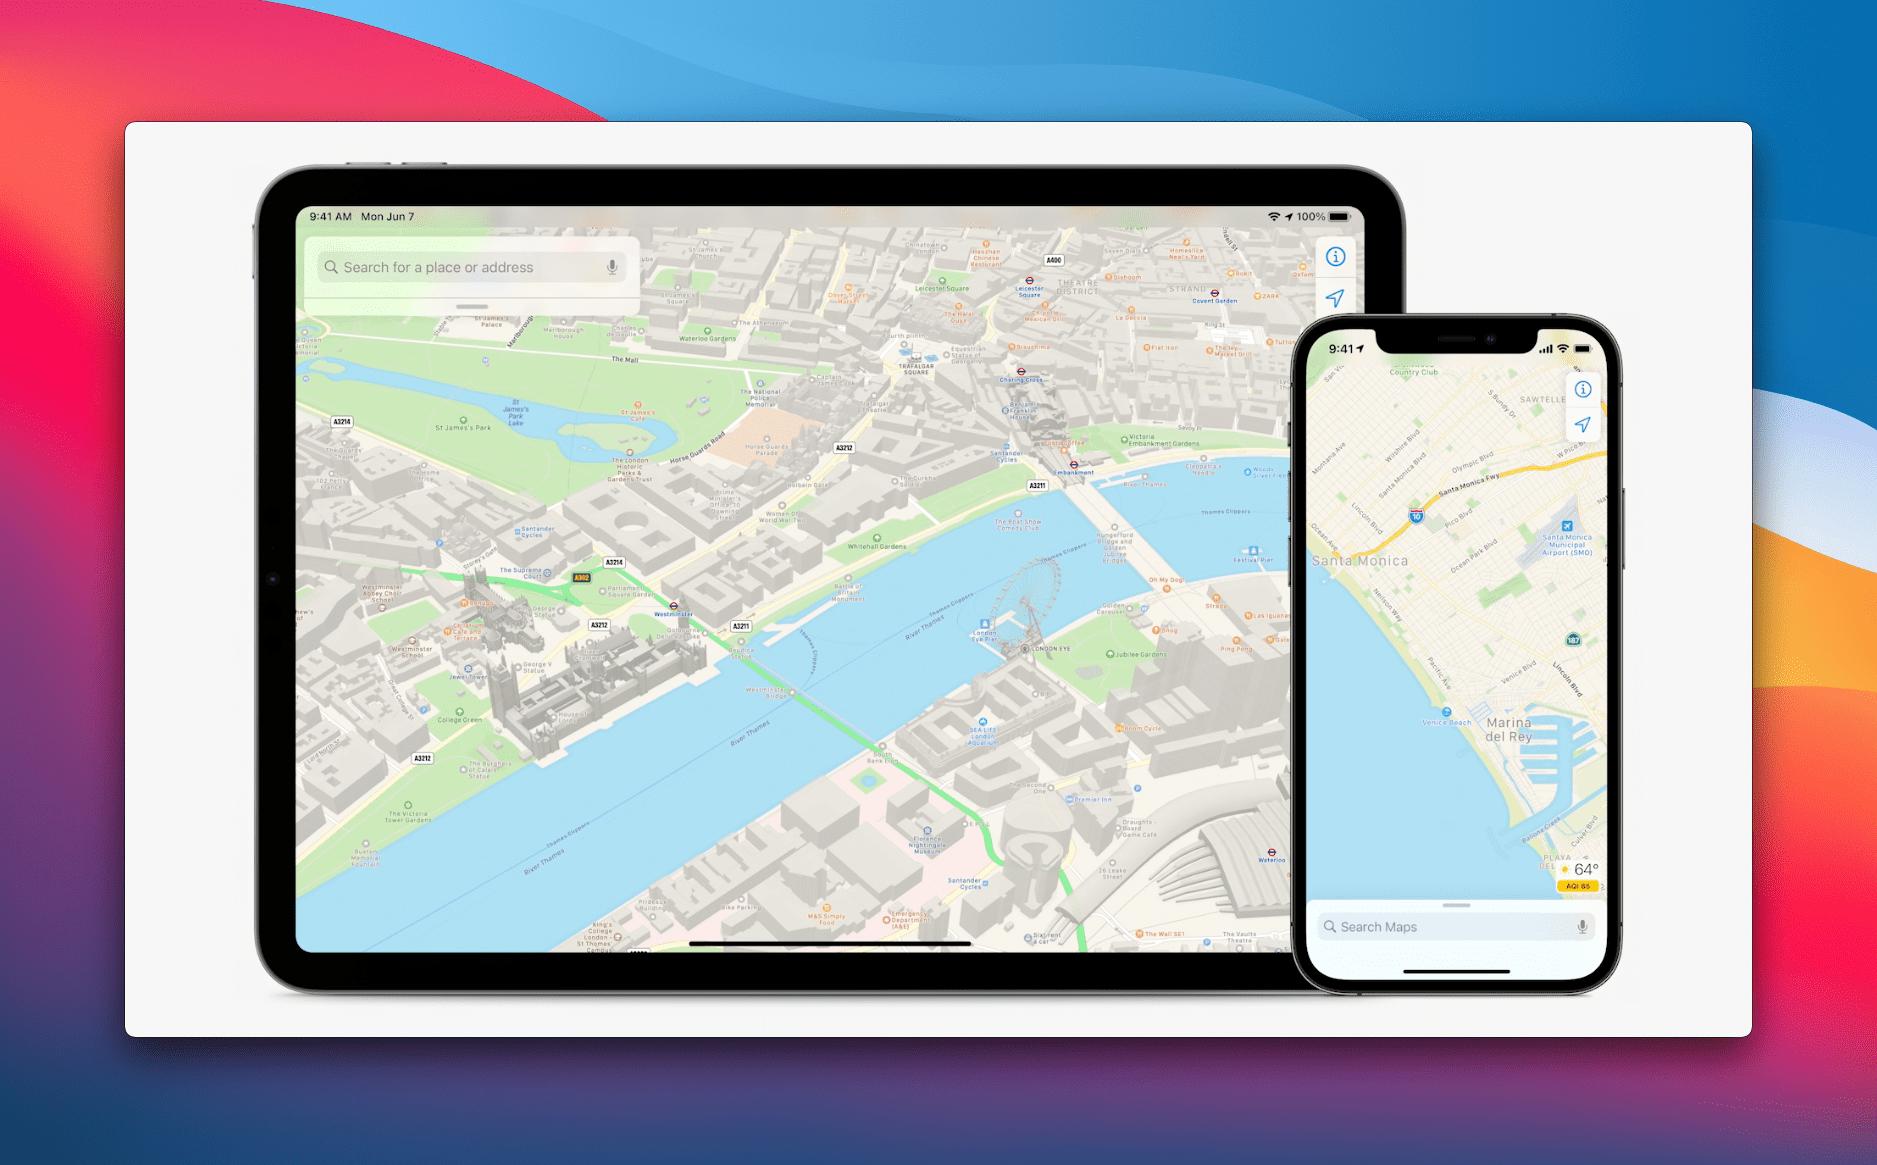 Apple Maps Update iOS and iPad